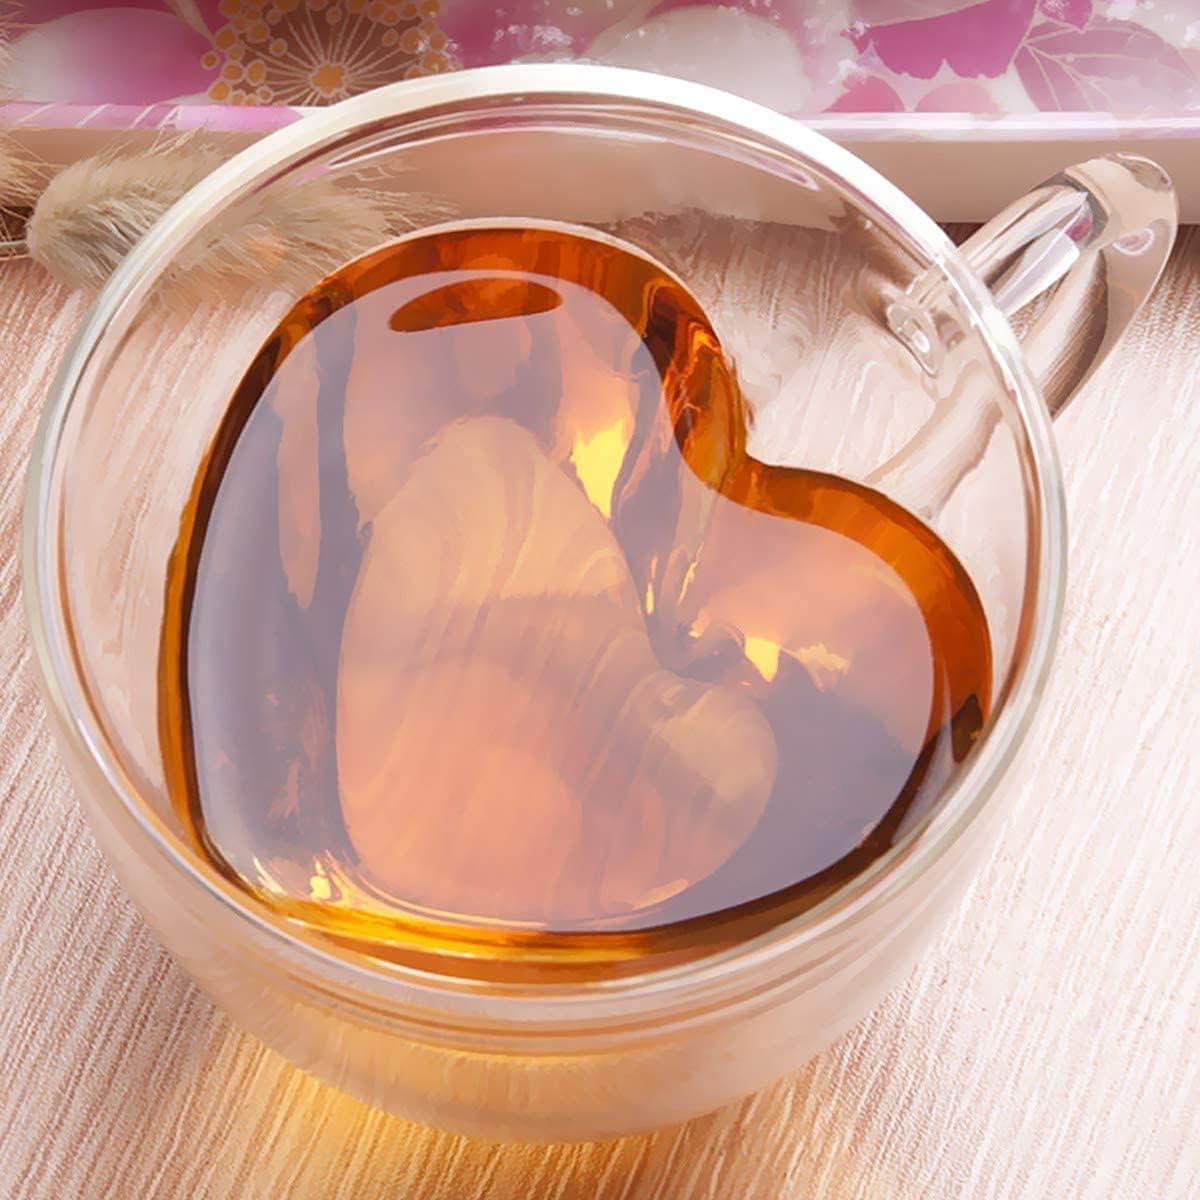 Rircio Creative Double Layer Heart Shaped Cup - Coffee Mugs - Heart Tea Cups, Clear Borosilicate Glass Mug for Latte, Tea, Ice Coffee, juice - Double Wall Insulated Heart Mugs With Handle (8oz/240ML)